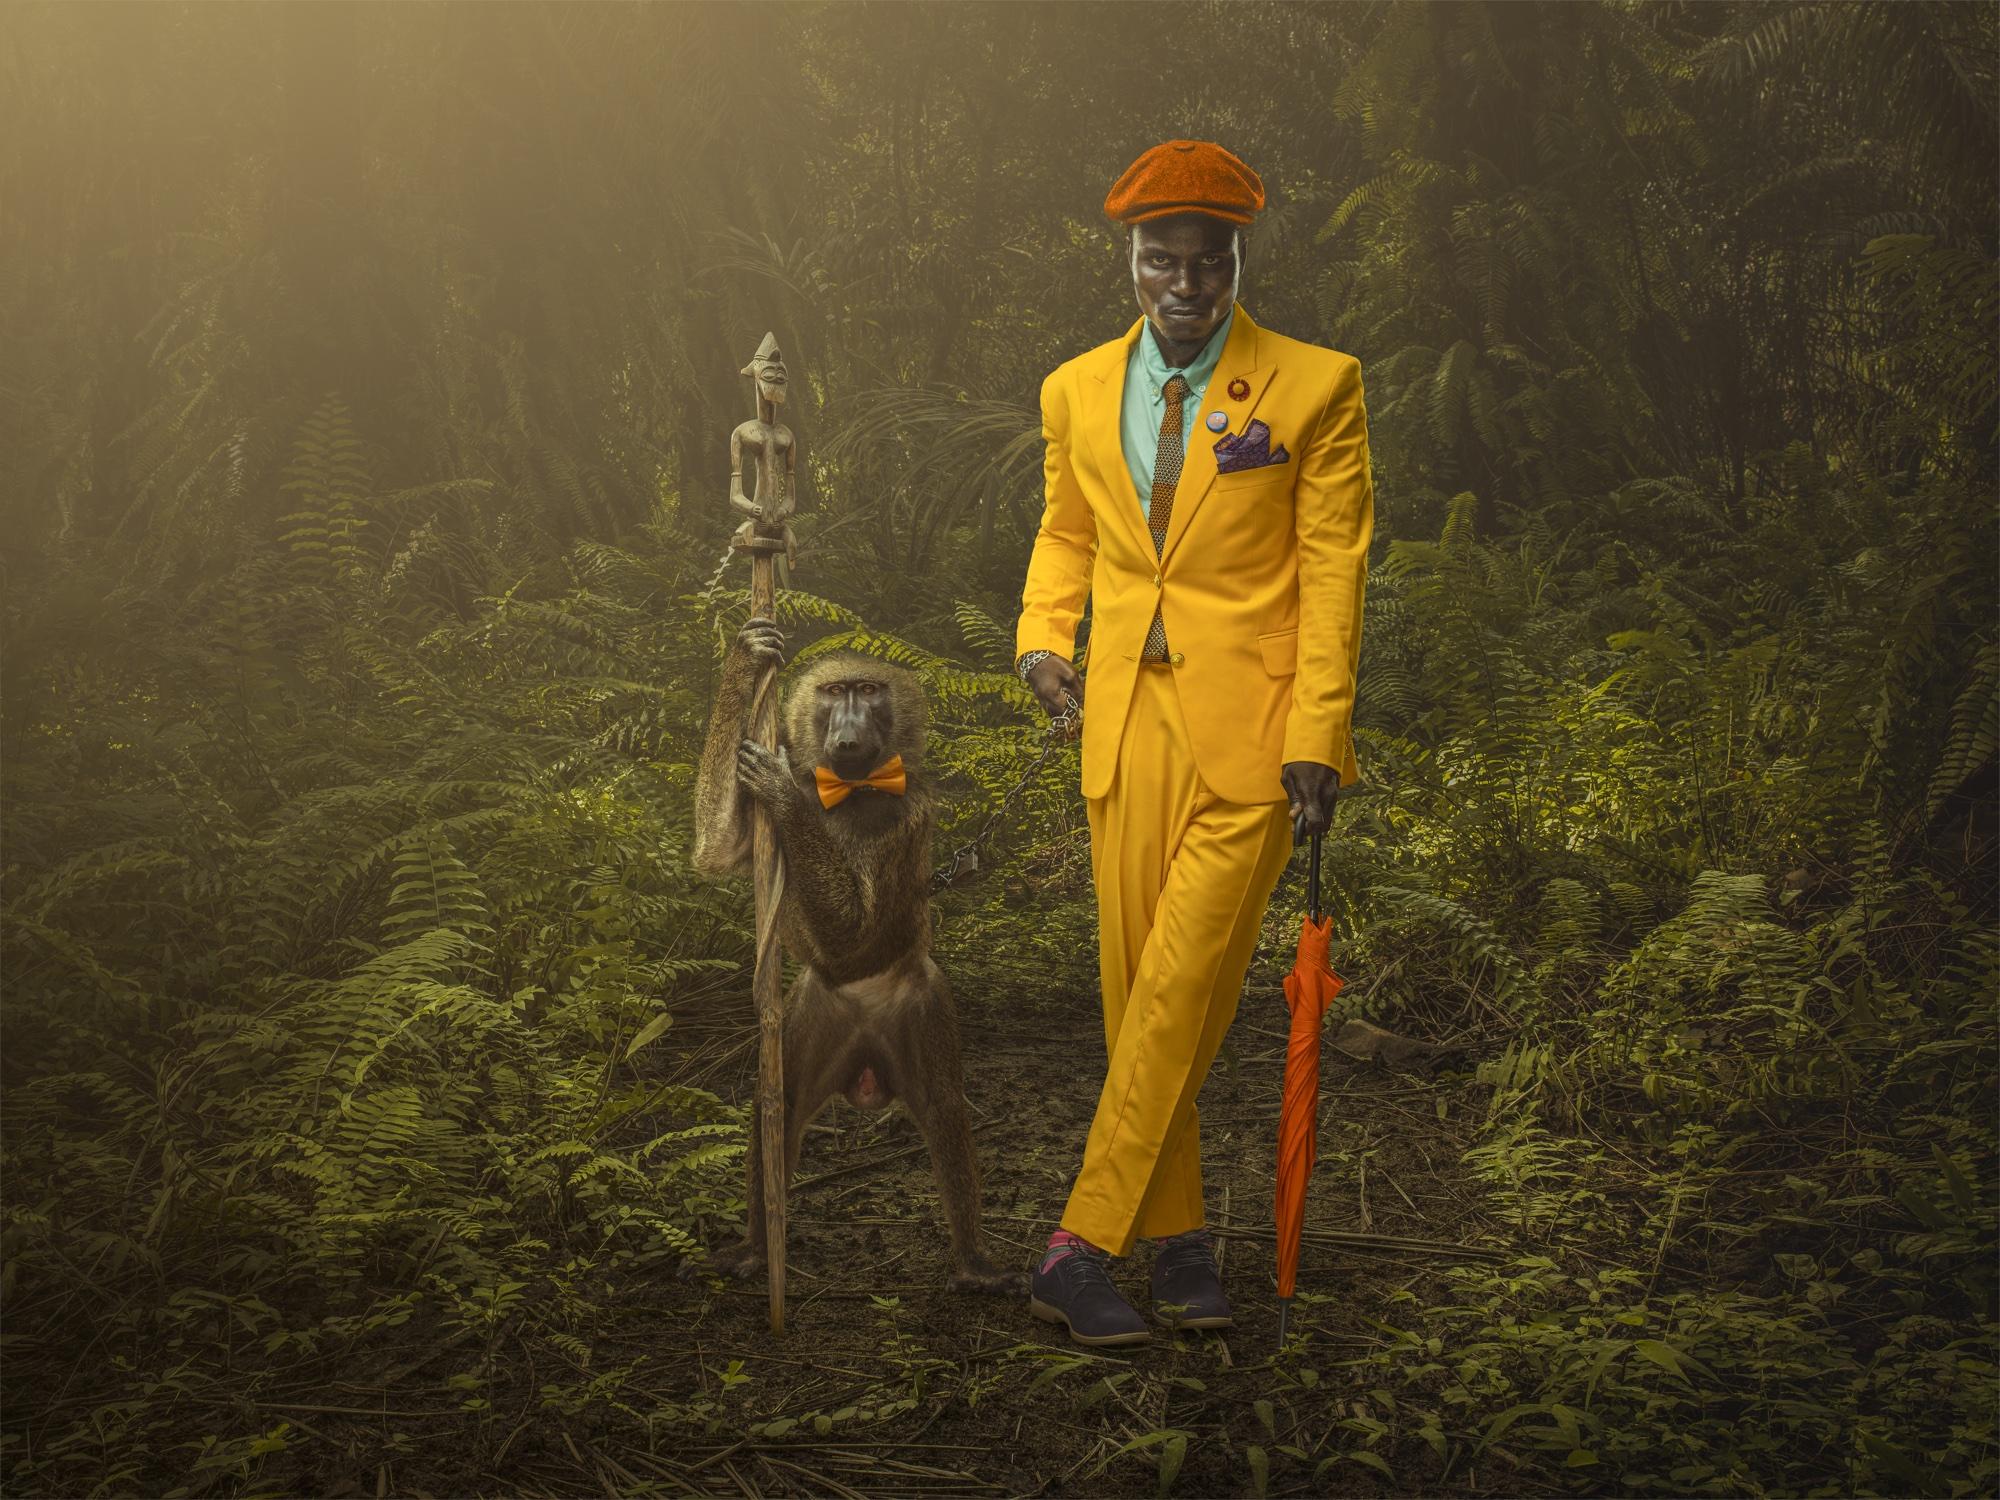 foto: ©Osborne Macharia - No Touch Am